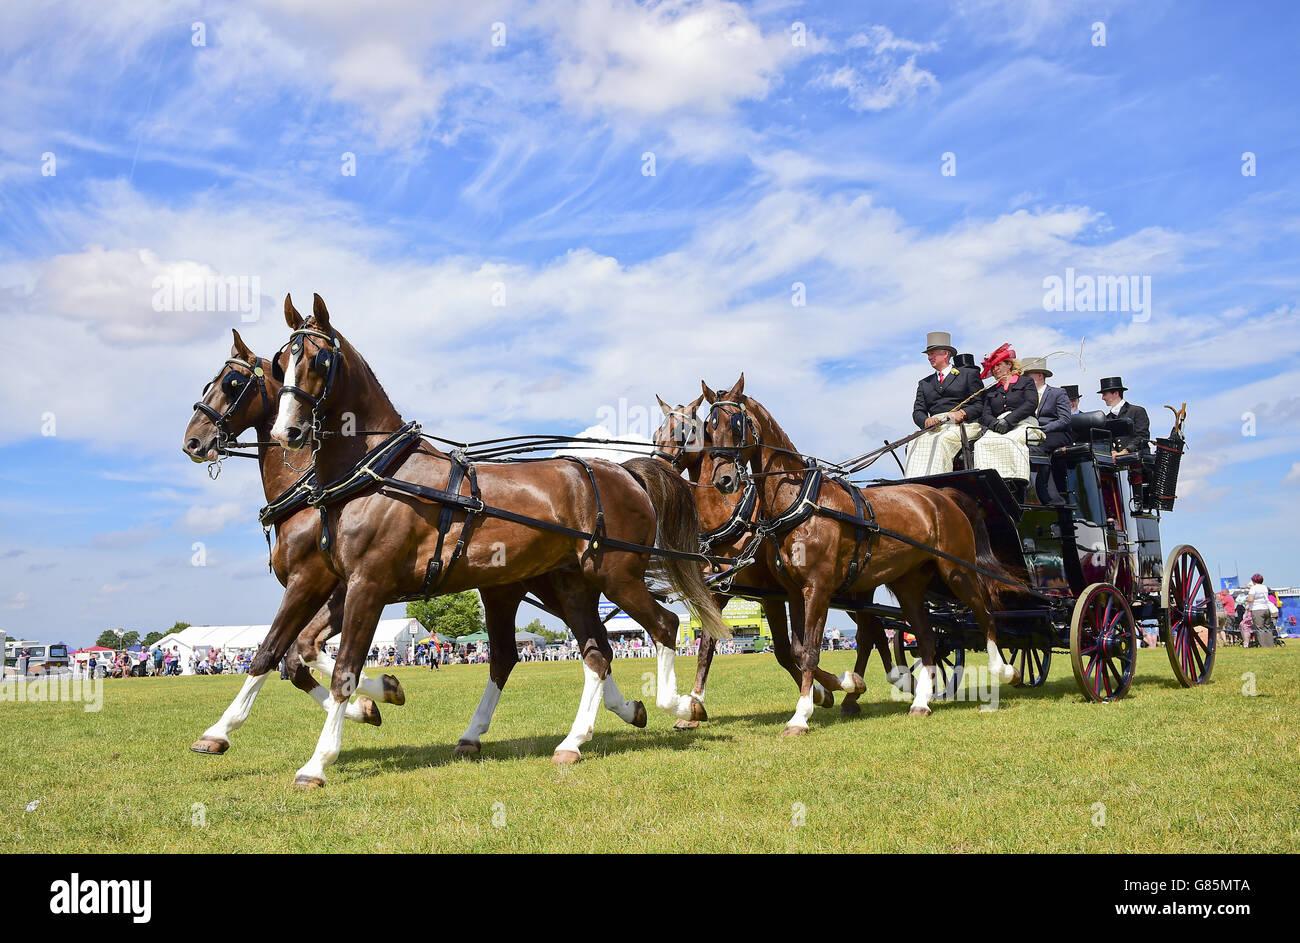 Coaching Marathon class at the Essex Heavy Horse show at the Orsett Showground, Essex. PRESS ASSOCIATION Photo. Stock Photo